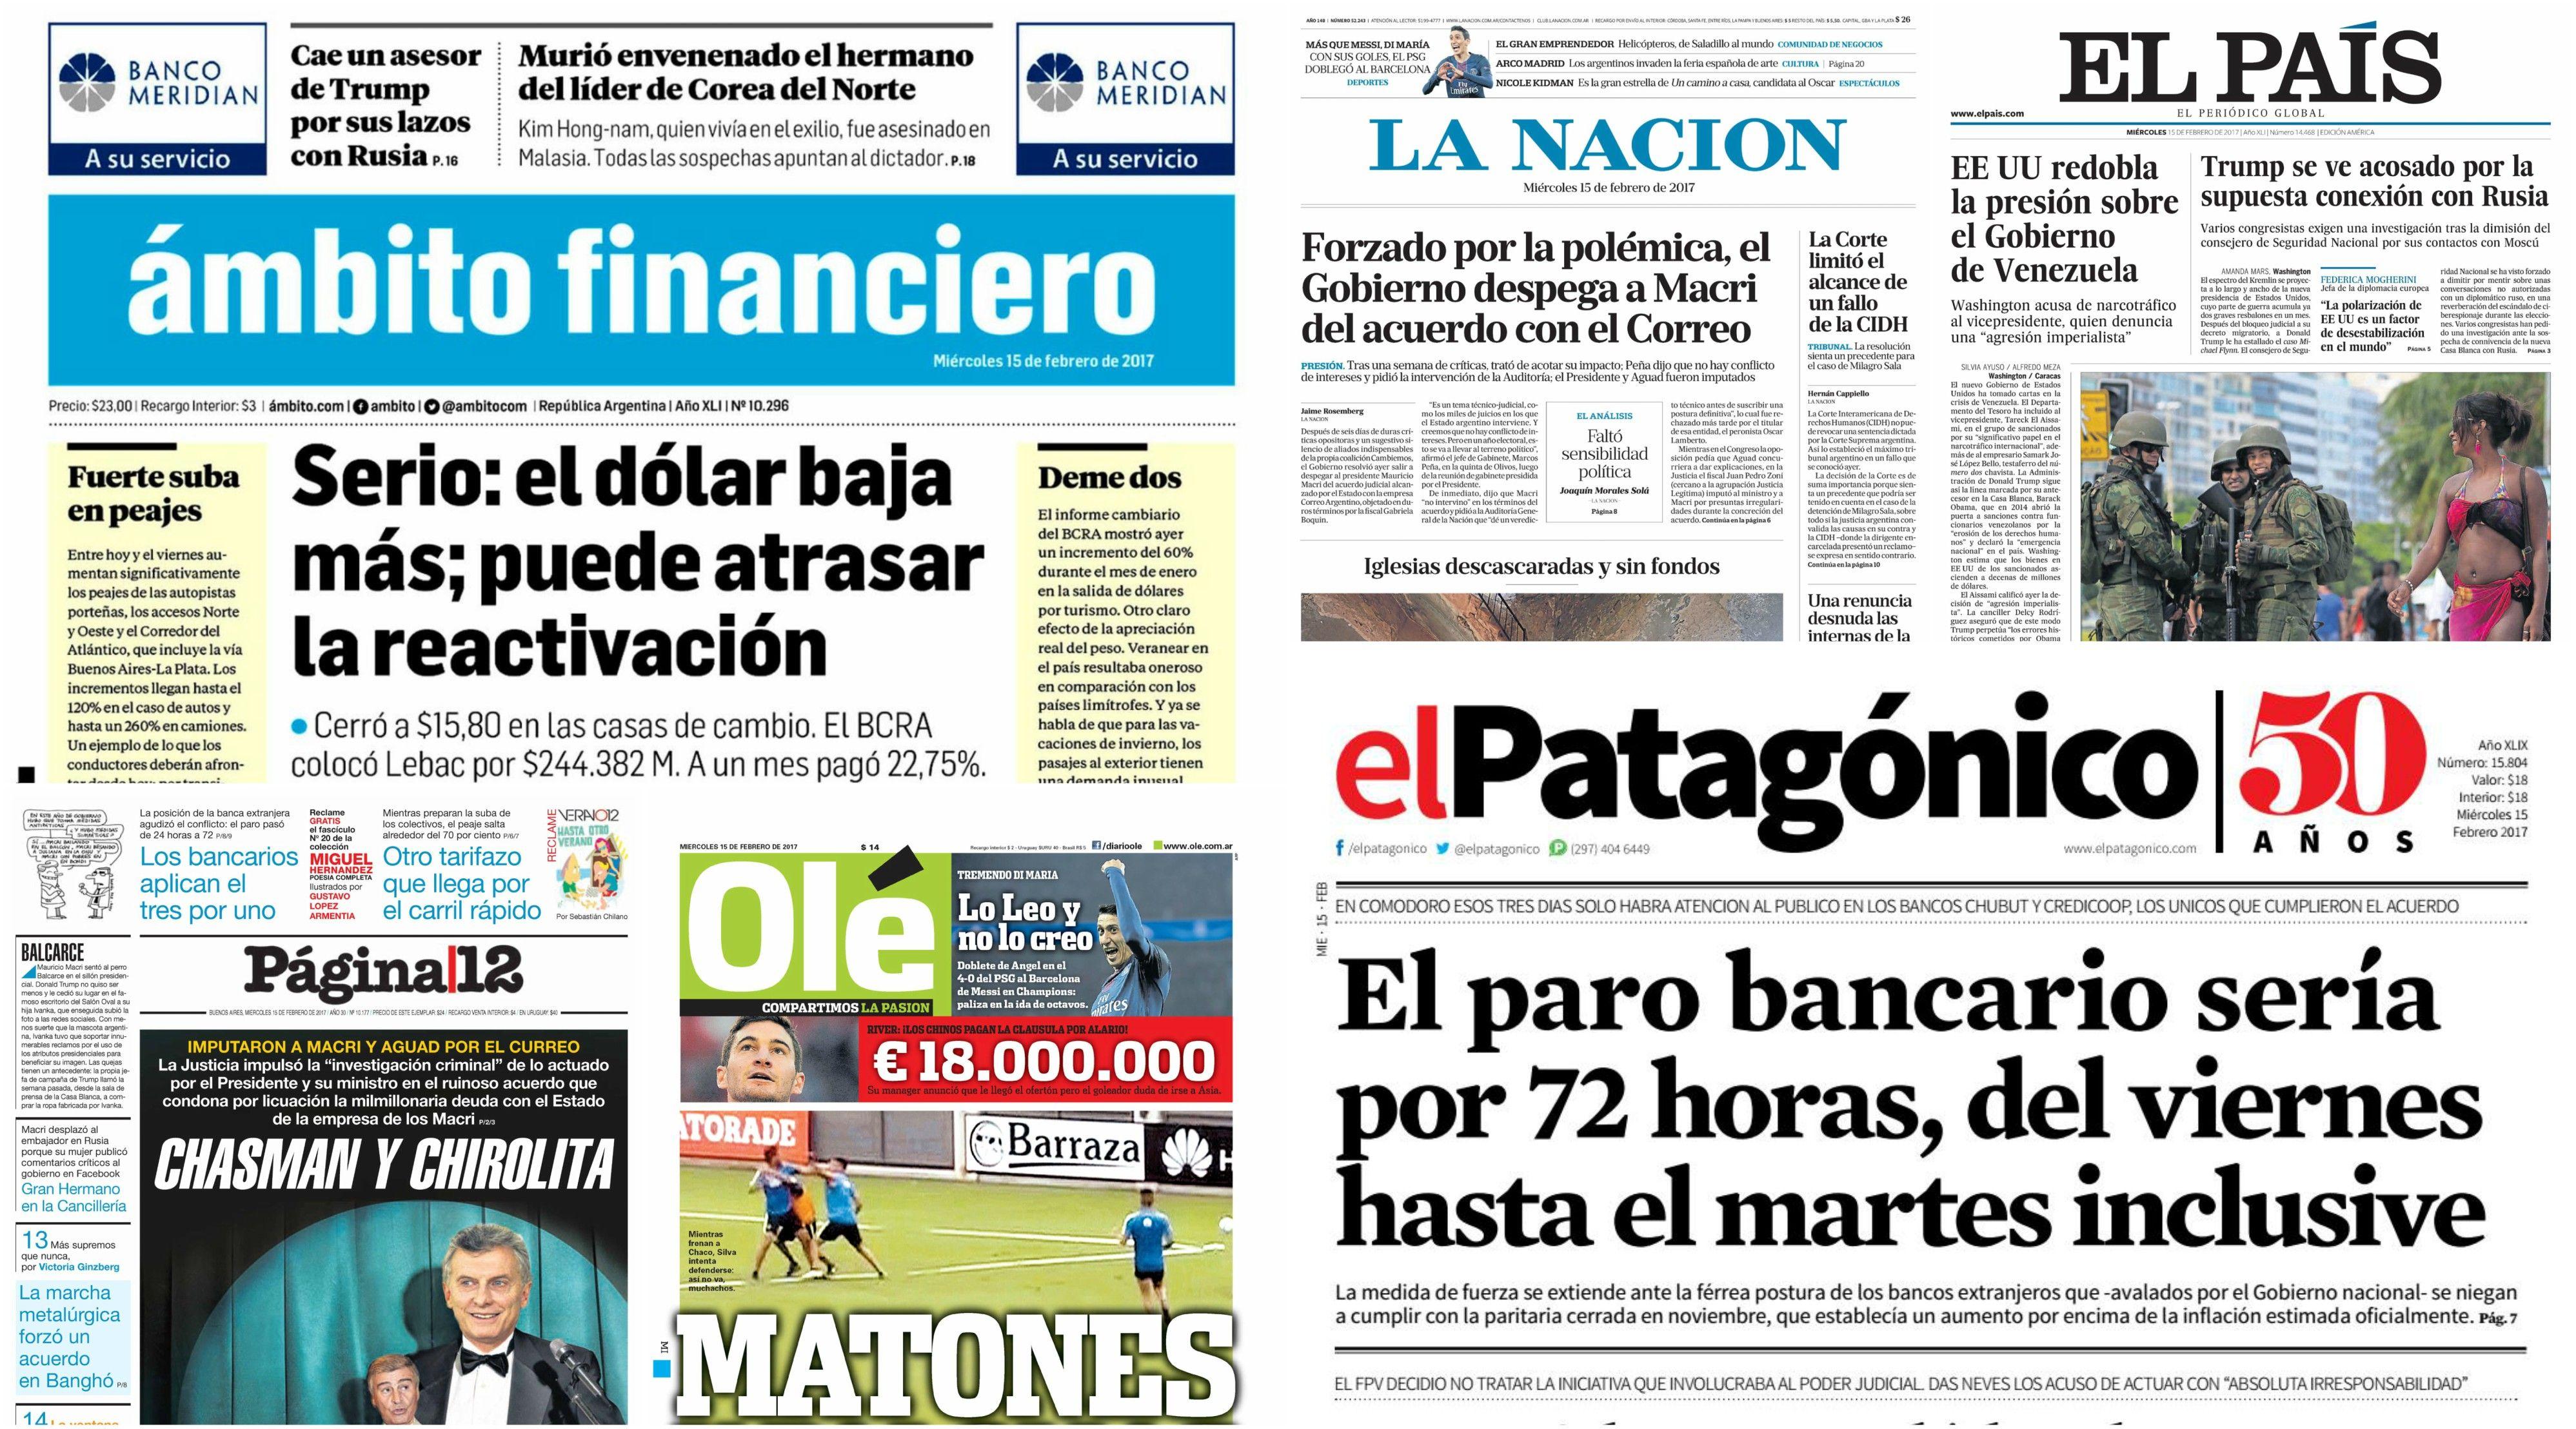 Tapas de diarios del miércoles 15 de febrero de 2017